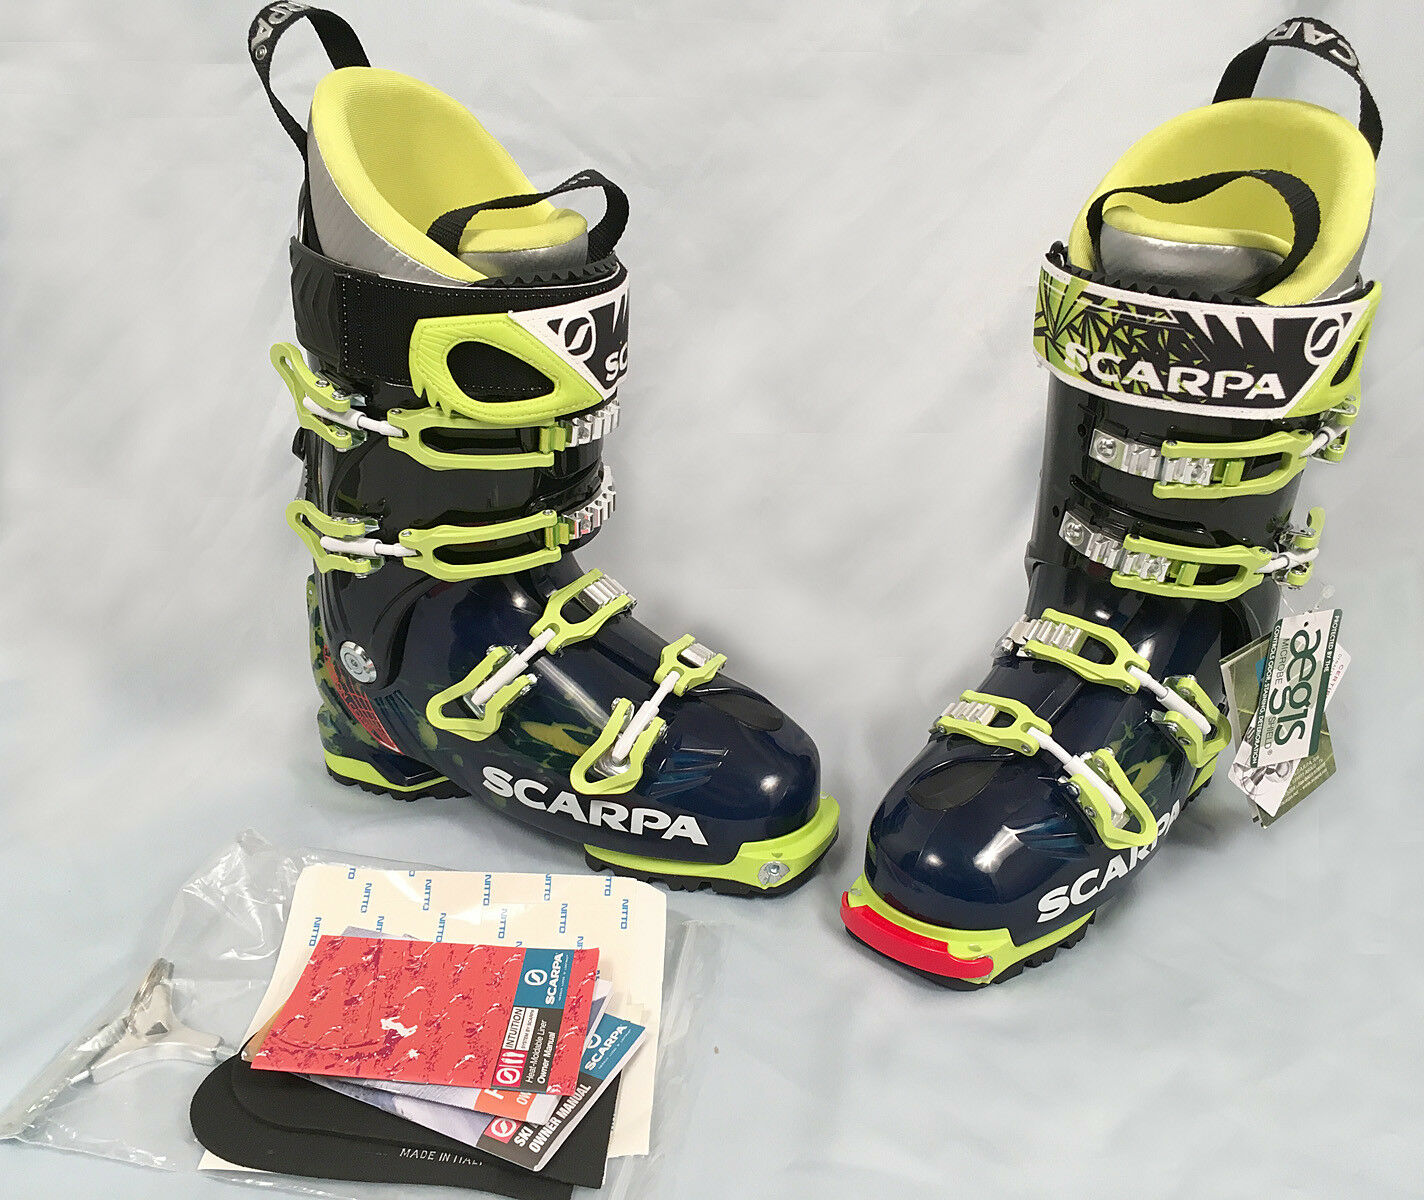 NEW  779 Scarpa Freedom SL Alpine Touring  Ski Boots   Mens  Size Mondo 26  cheap